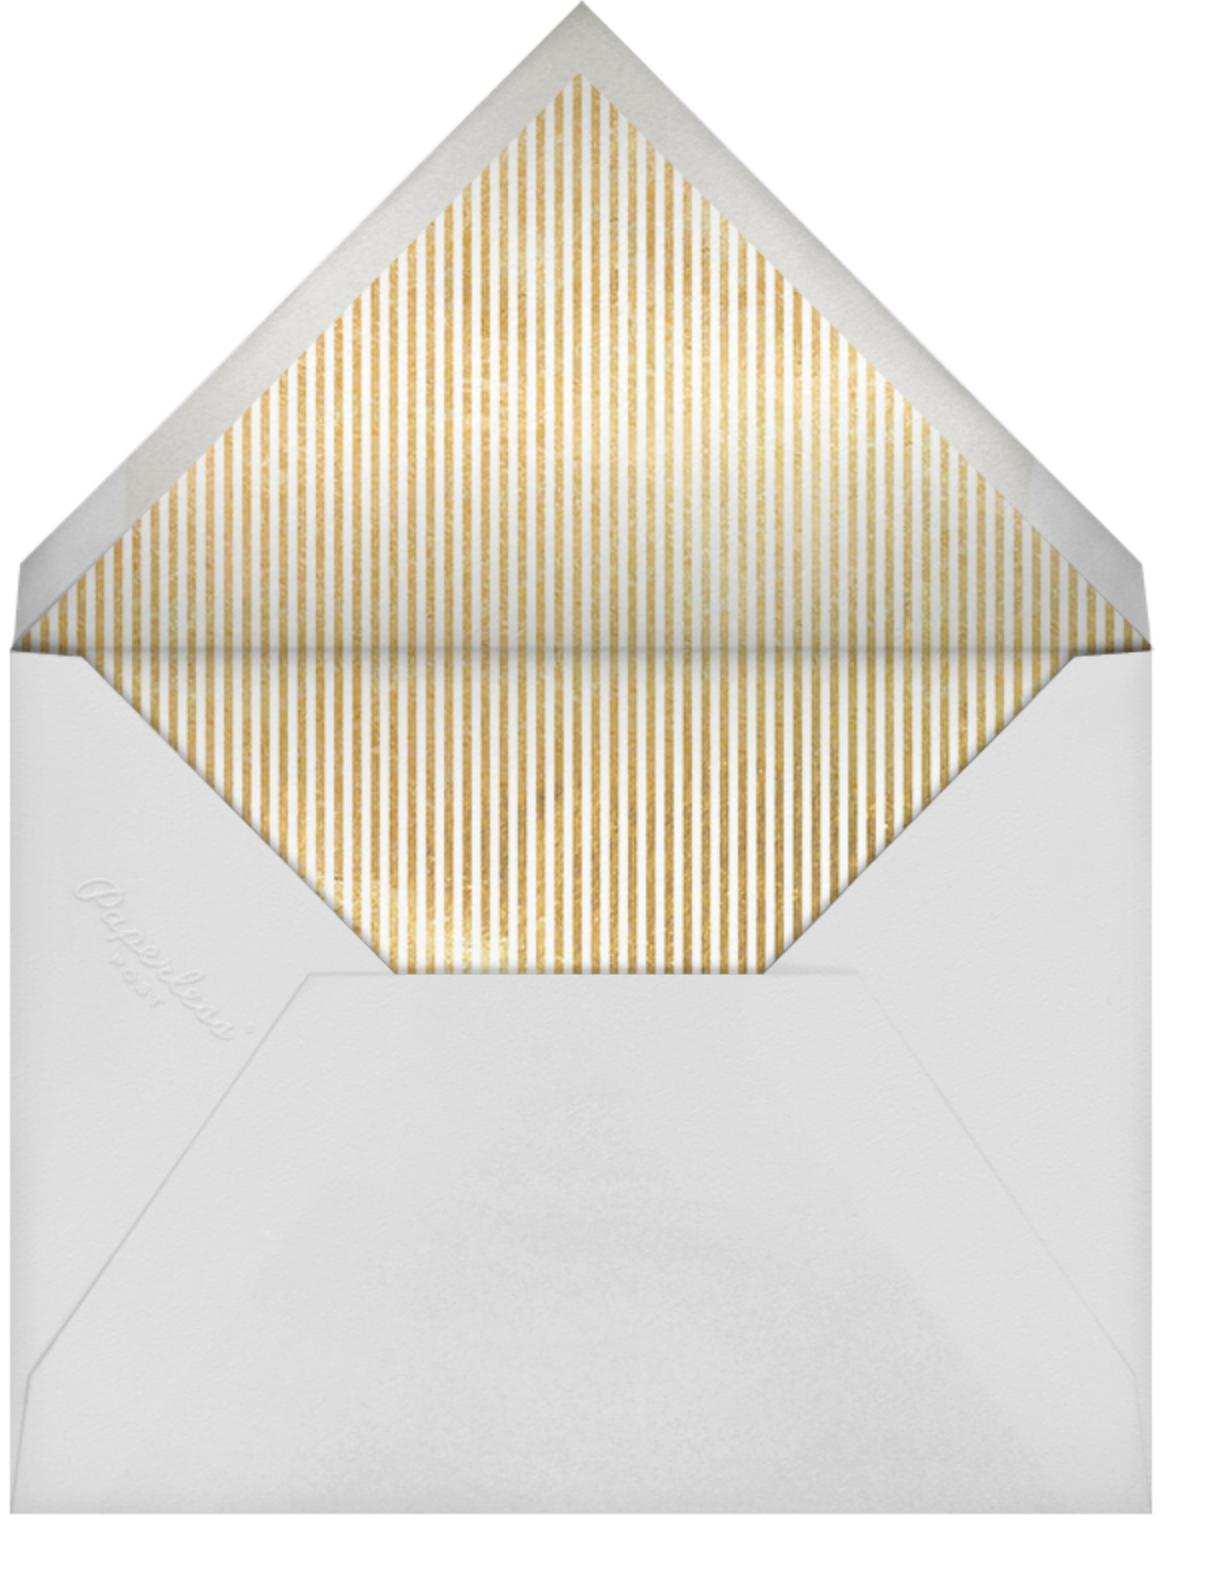 Milestone Dots (Fifty) - Navy - Sugar Paper - Adult birthday - envelope back